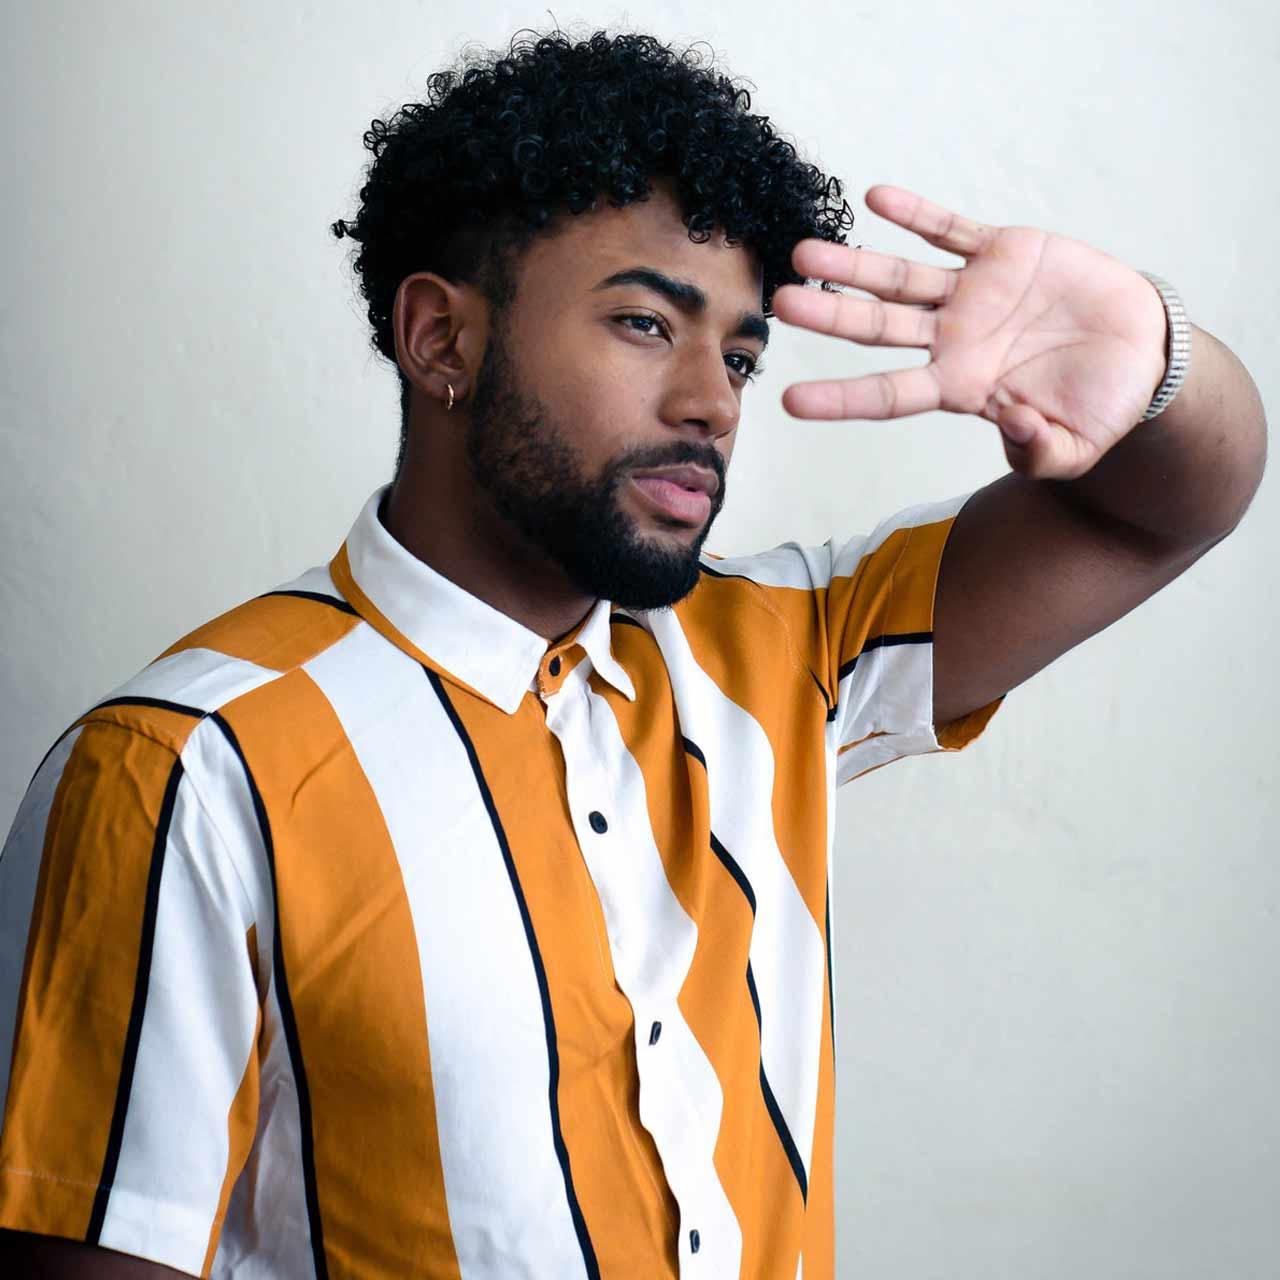 man-wearing-orange-and-white-striped-polo-shirt-3266352